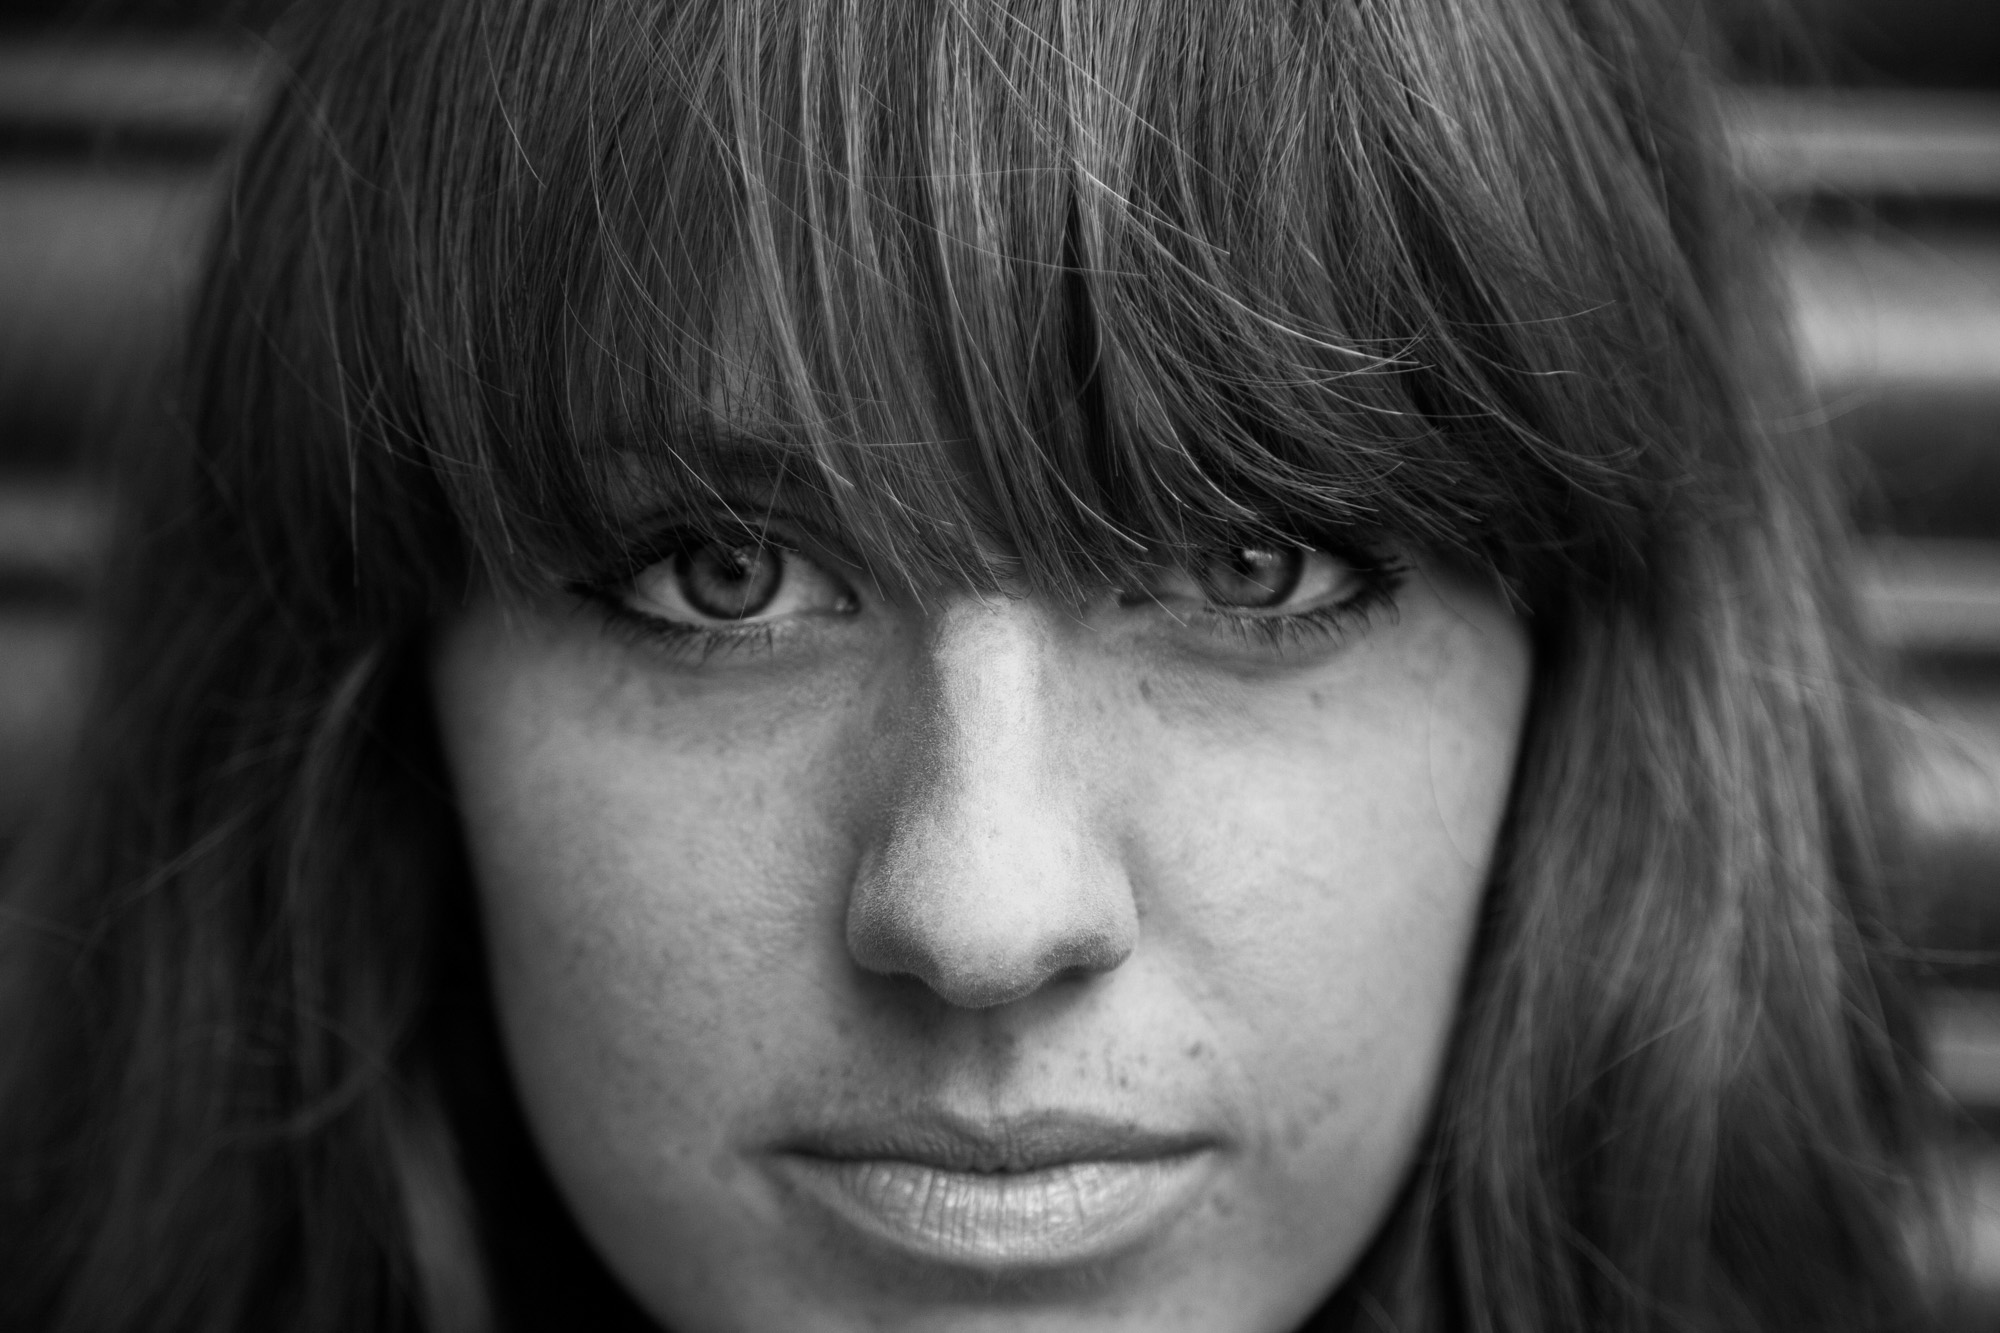 portraits-photographer-oxford-london-jonathan-self-photography_-5.jpg